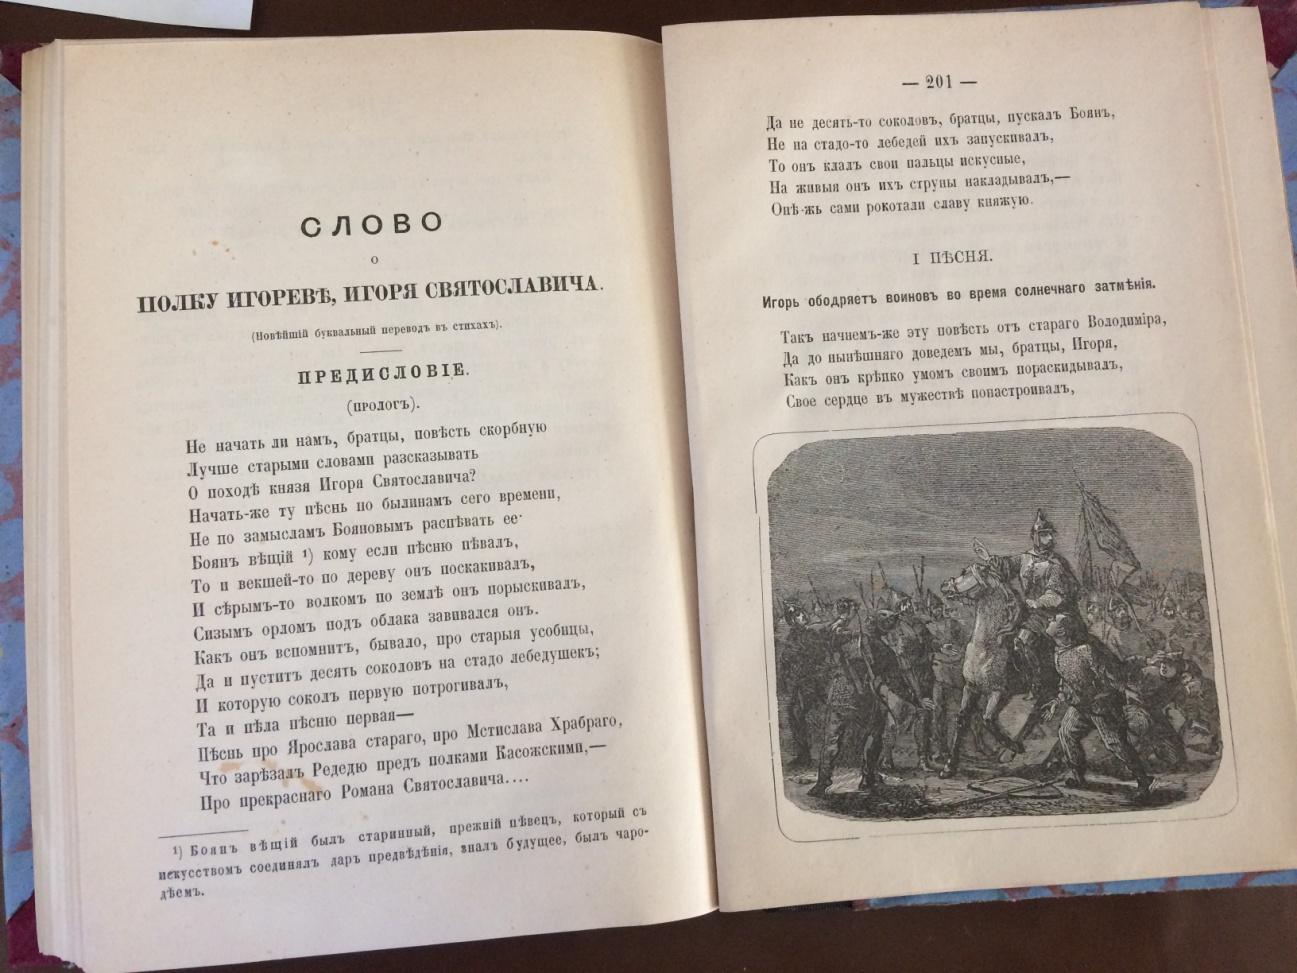 Рис. 25. Разворот книги. «Слово…» в переводе Н.И .Алябьева.